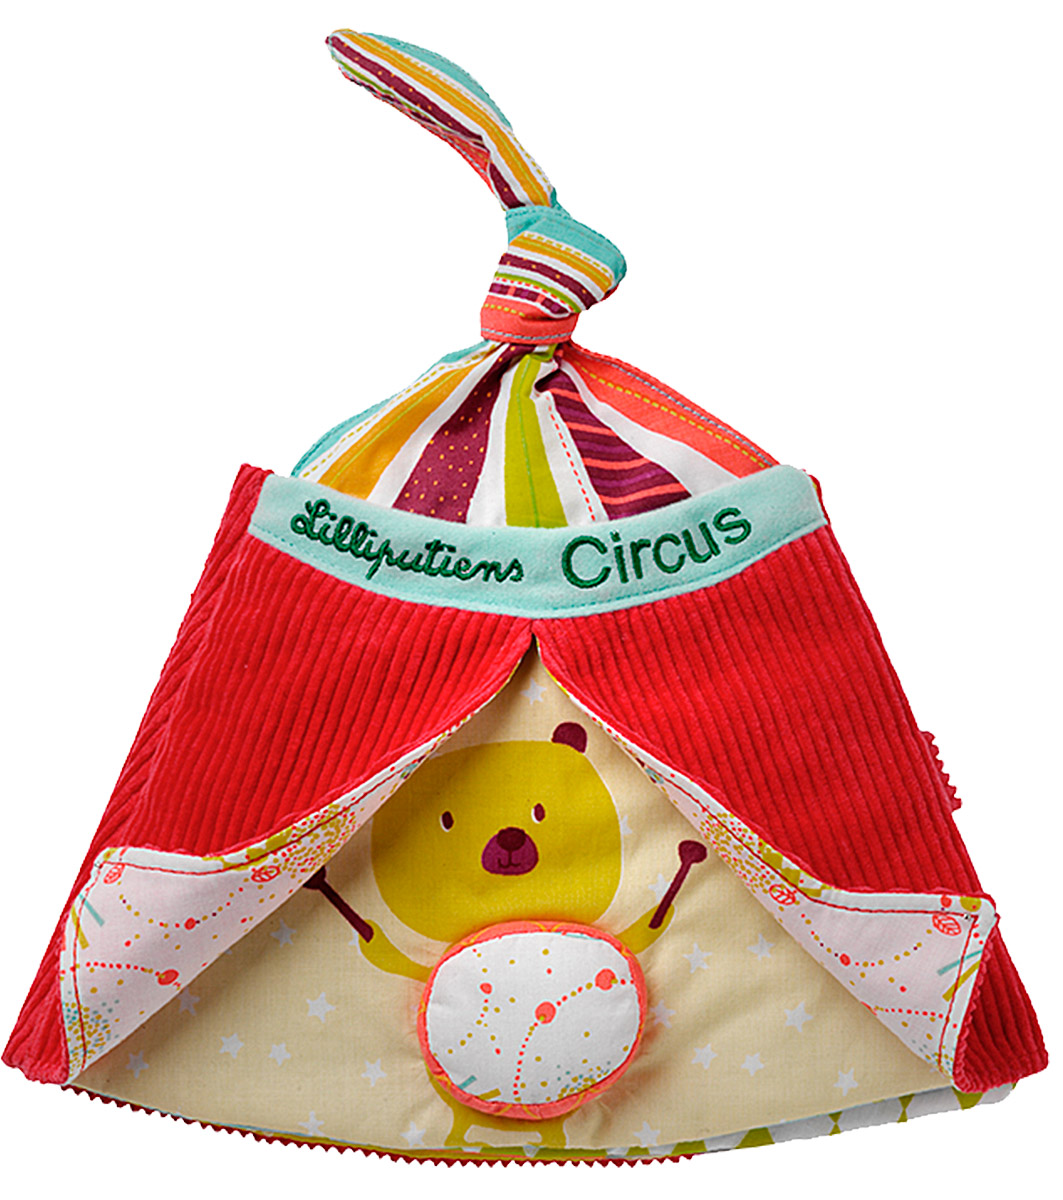 Lilliputiens Мягкая книжка-игрушка Цирк Шапито lilliputiens игрушка собачка джеф